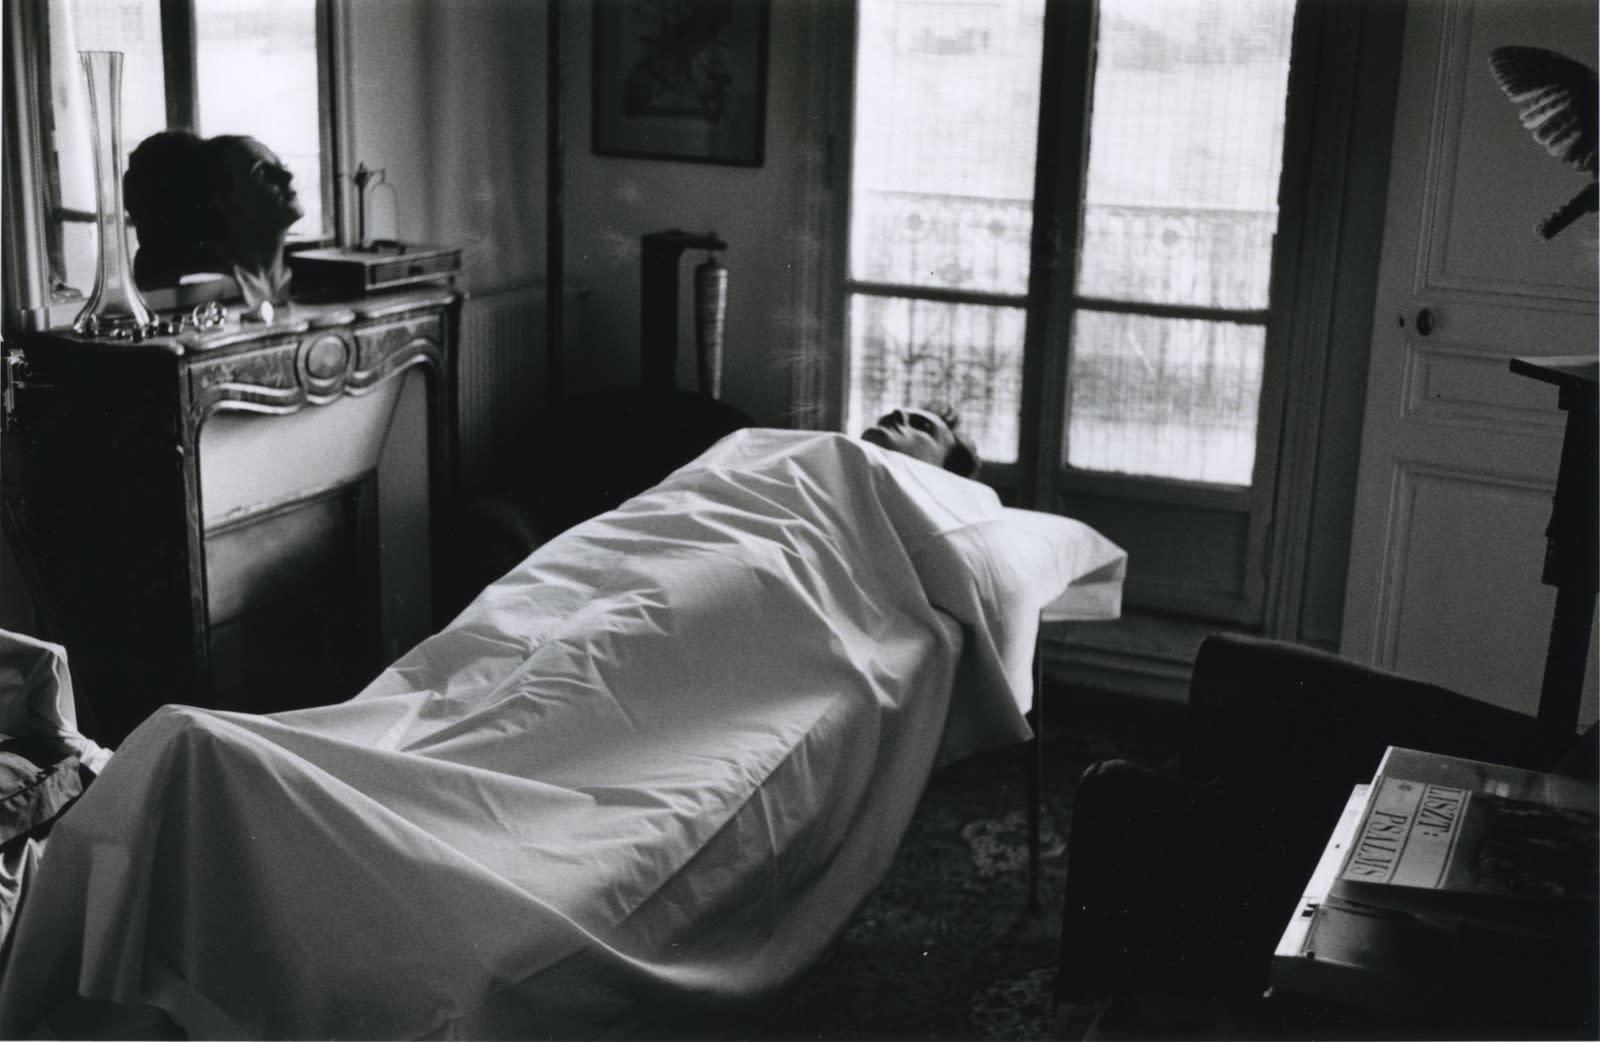 Hervé Guibert, Autoportrait gisant, 1986